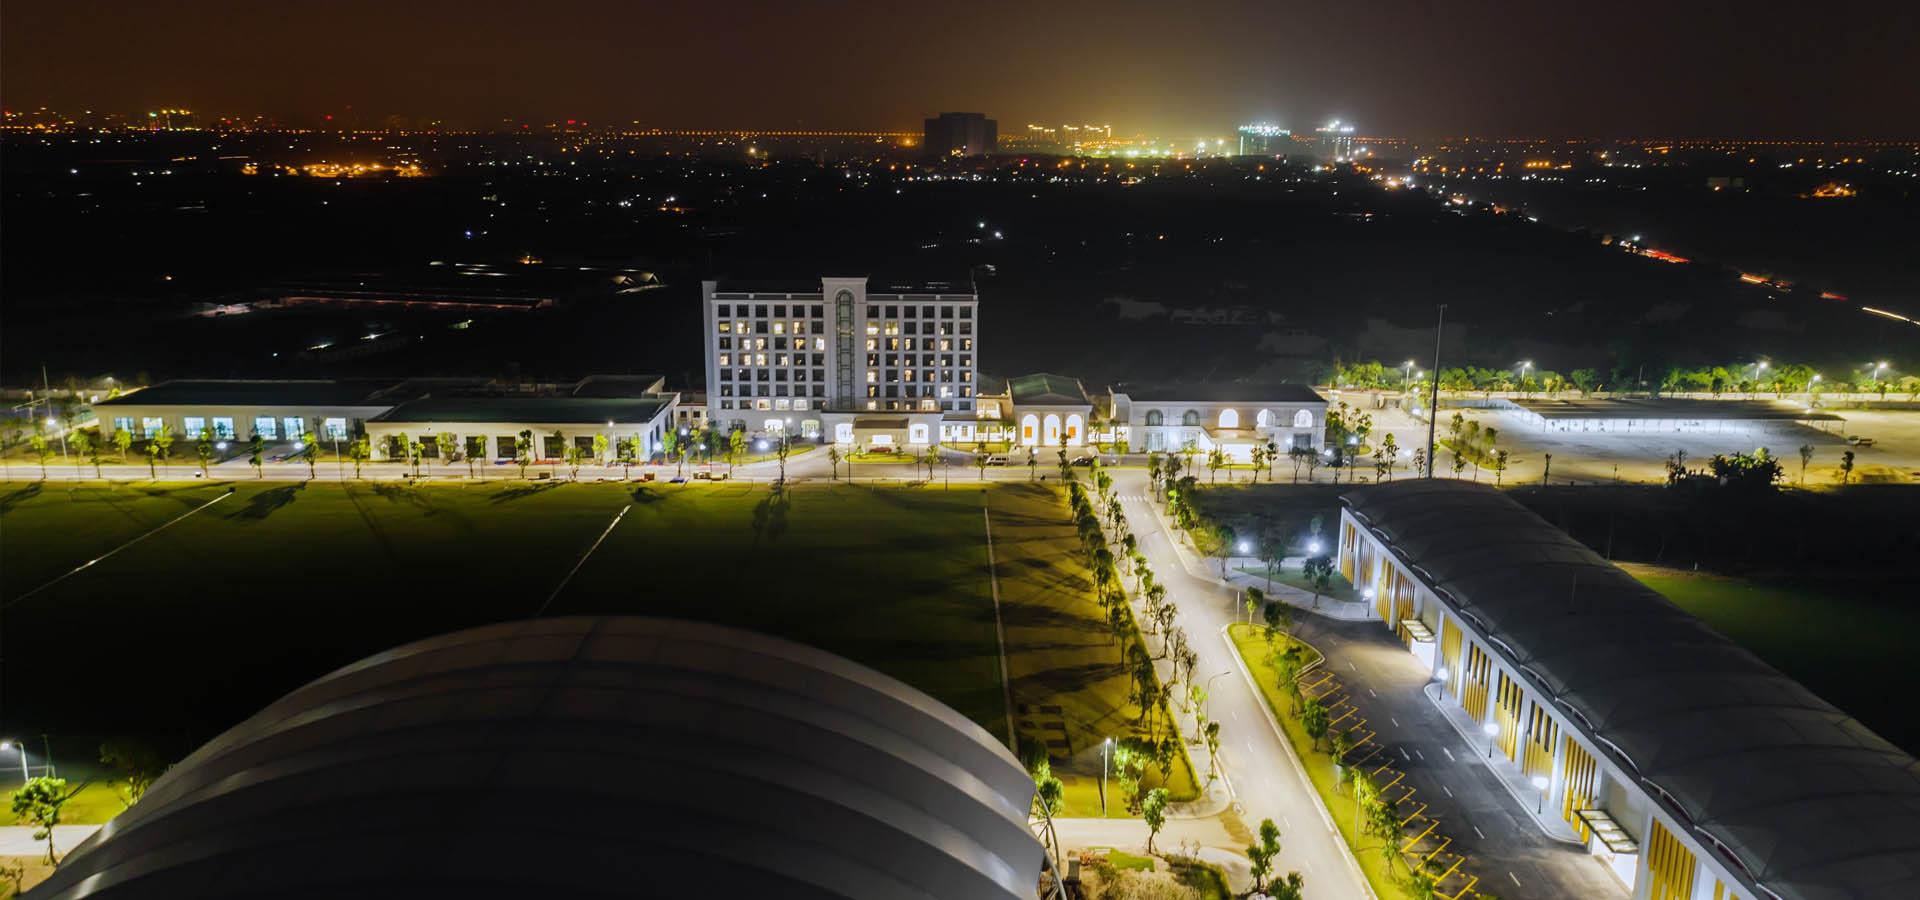 Winning through Vietnamese Aspirations